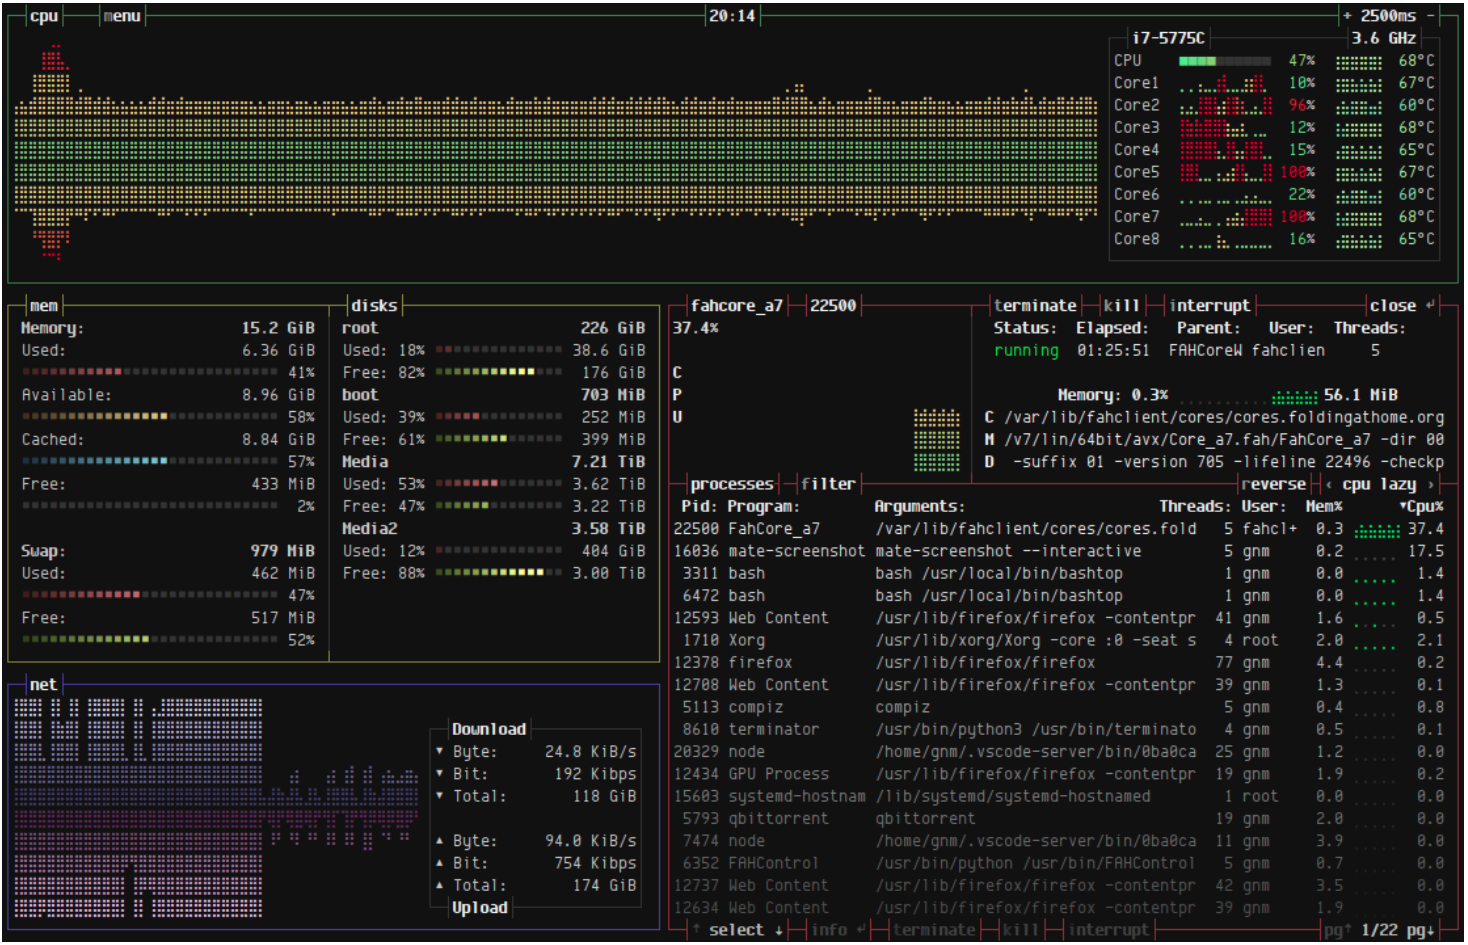 Linux 资源监视器 bashtop